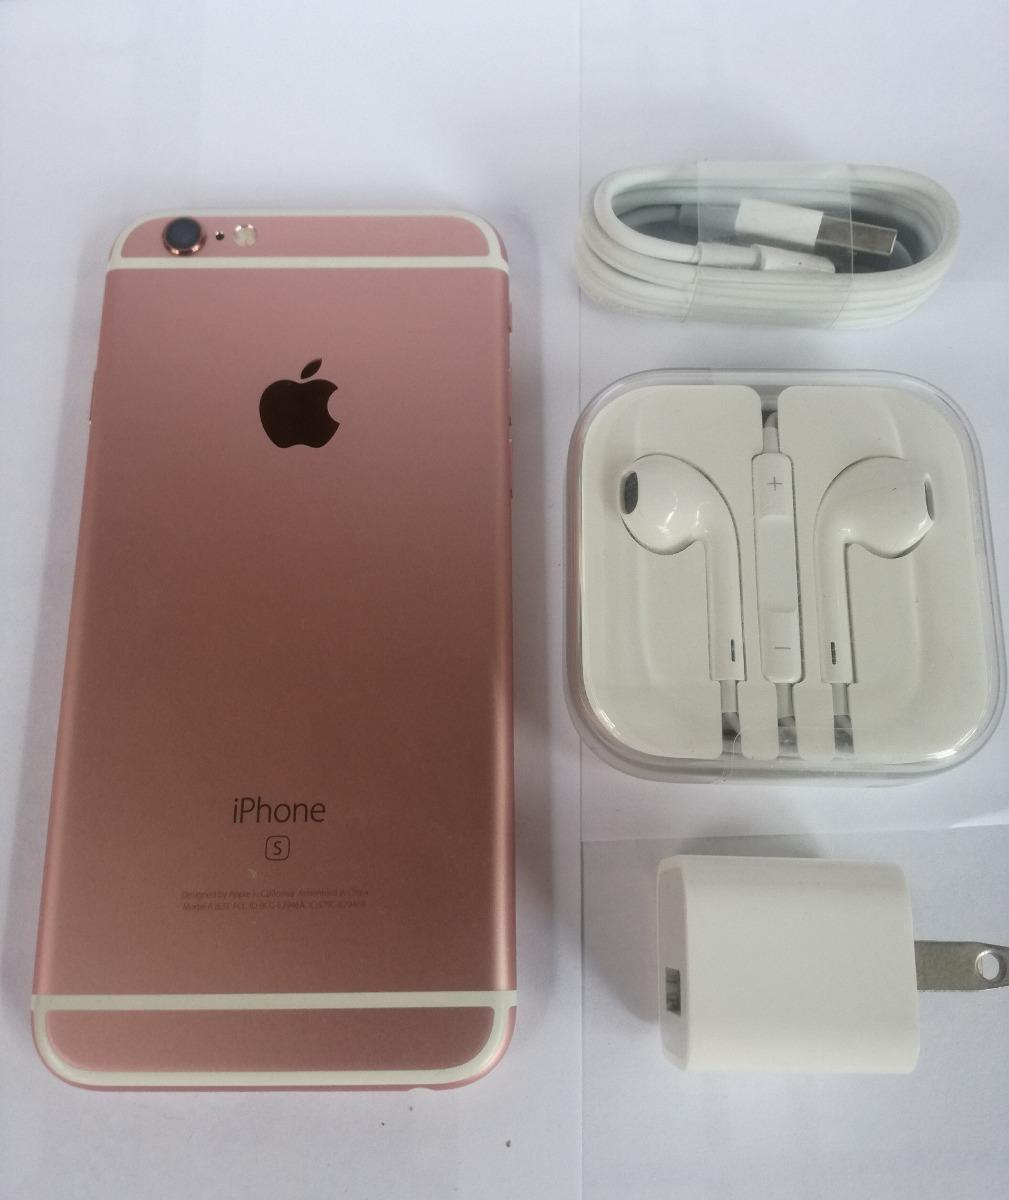 Oferta Iphone 6s 64gb Libre Rosado Rose Gold Regalos - S